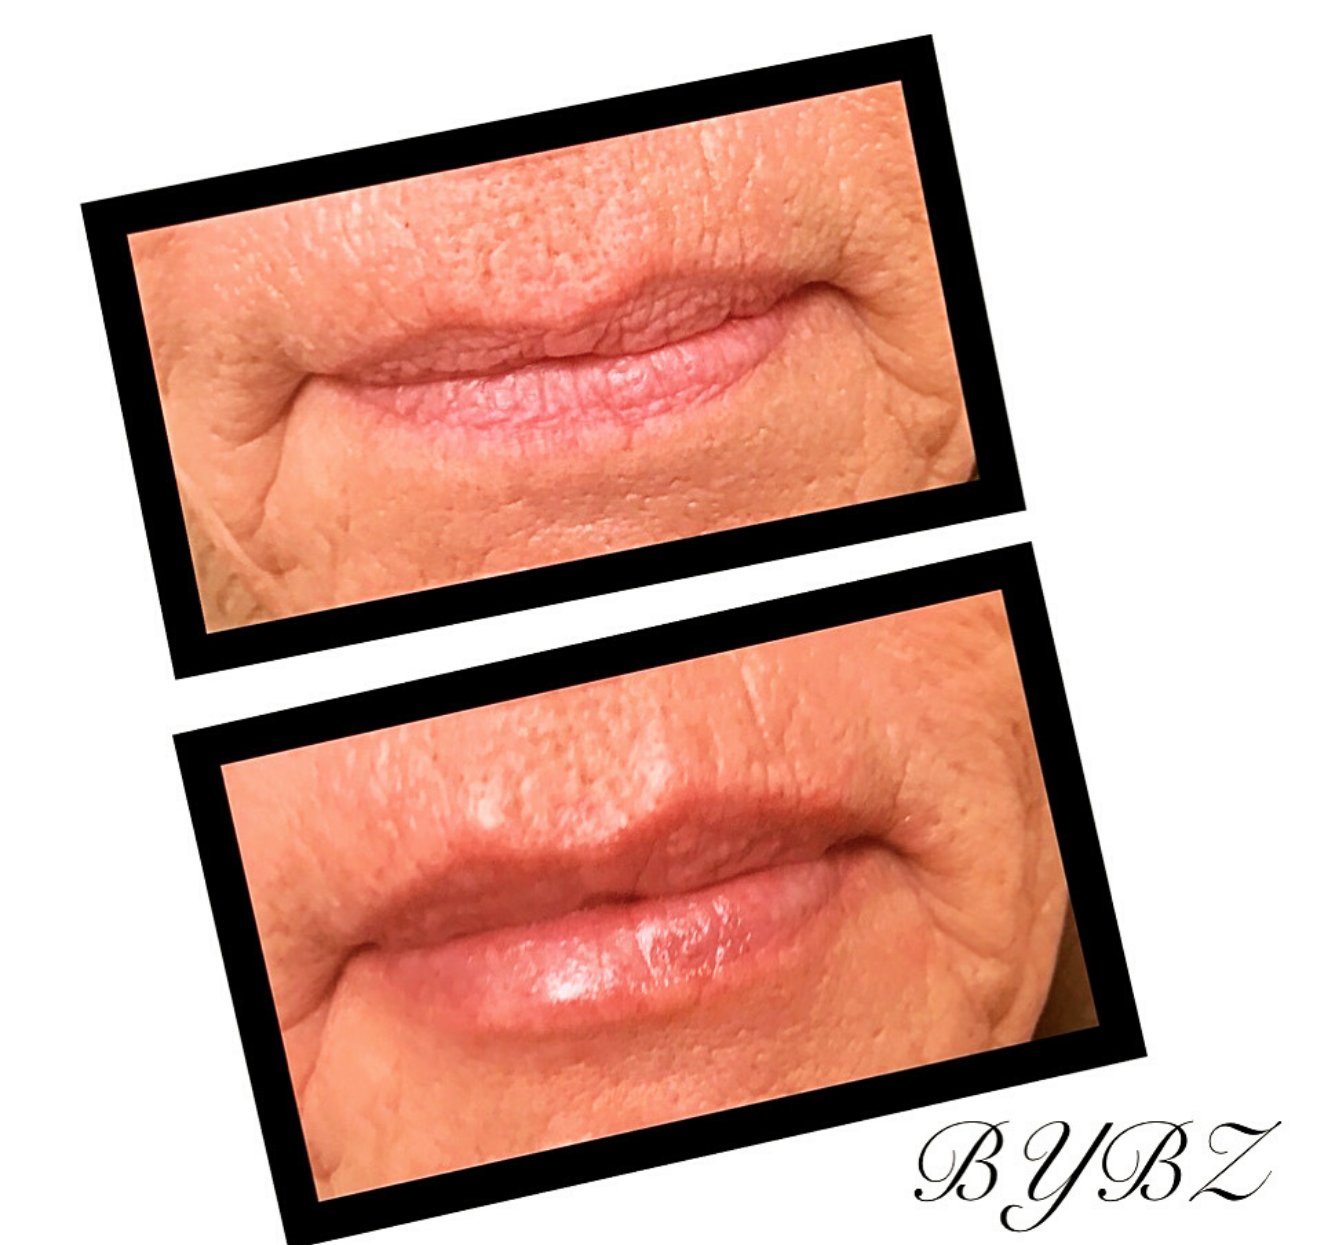 Lip Enhancements Hudson Valley